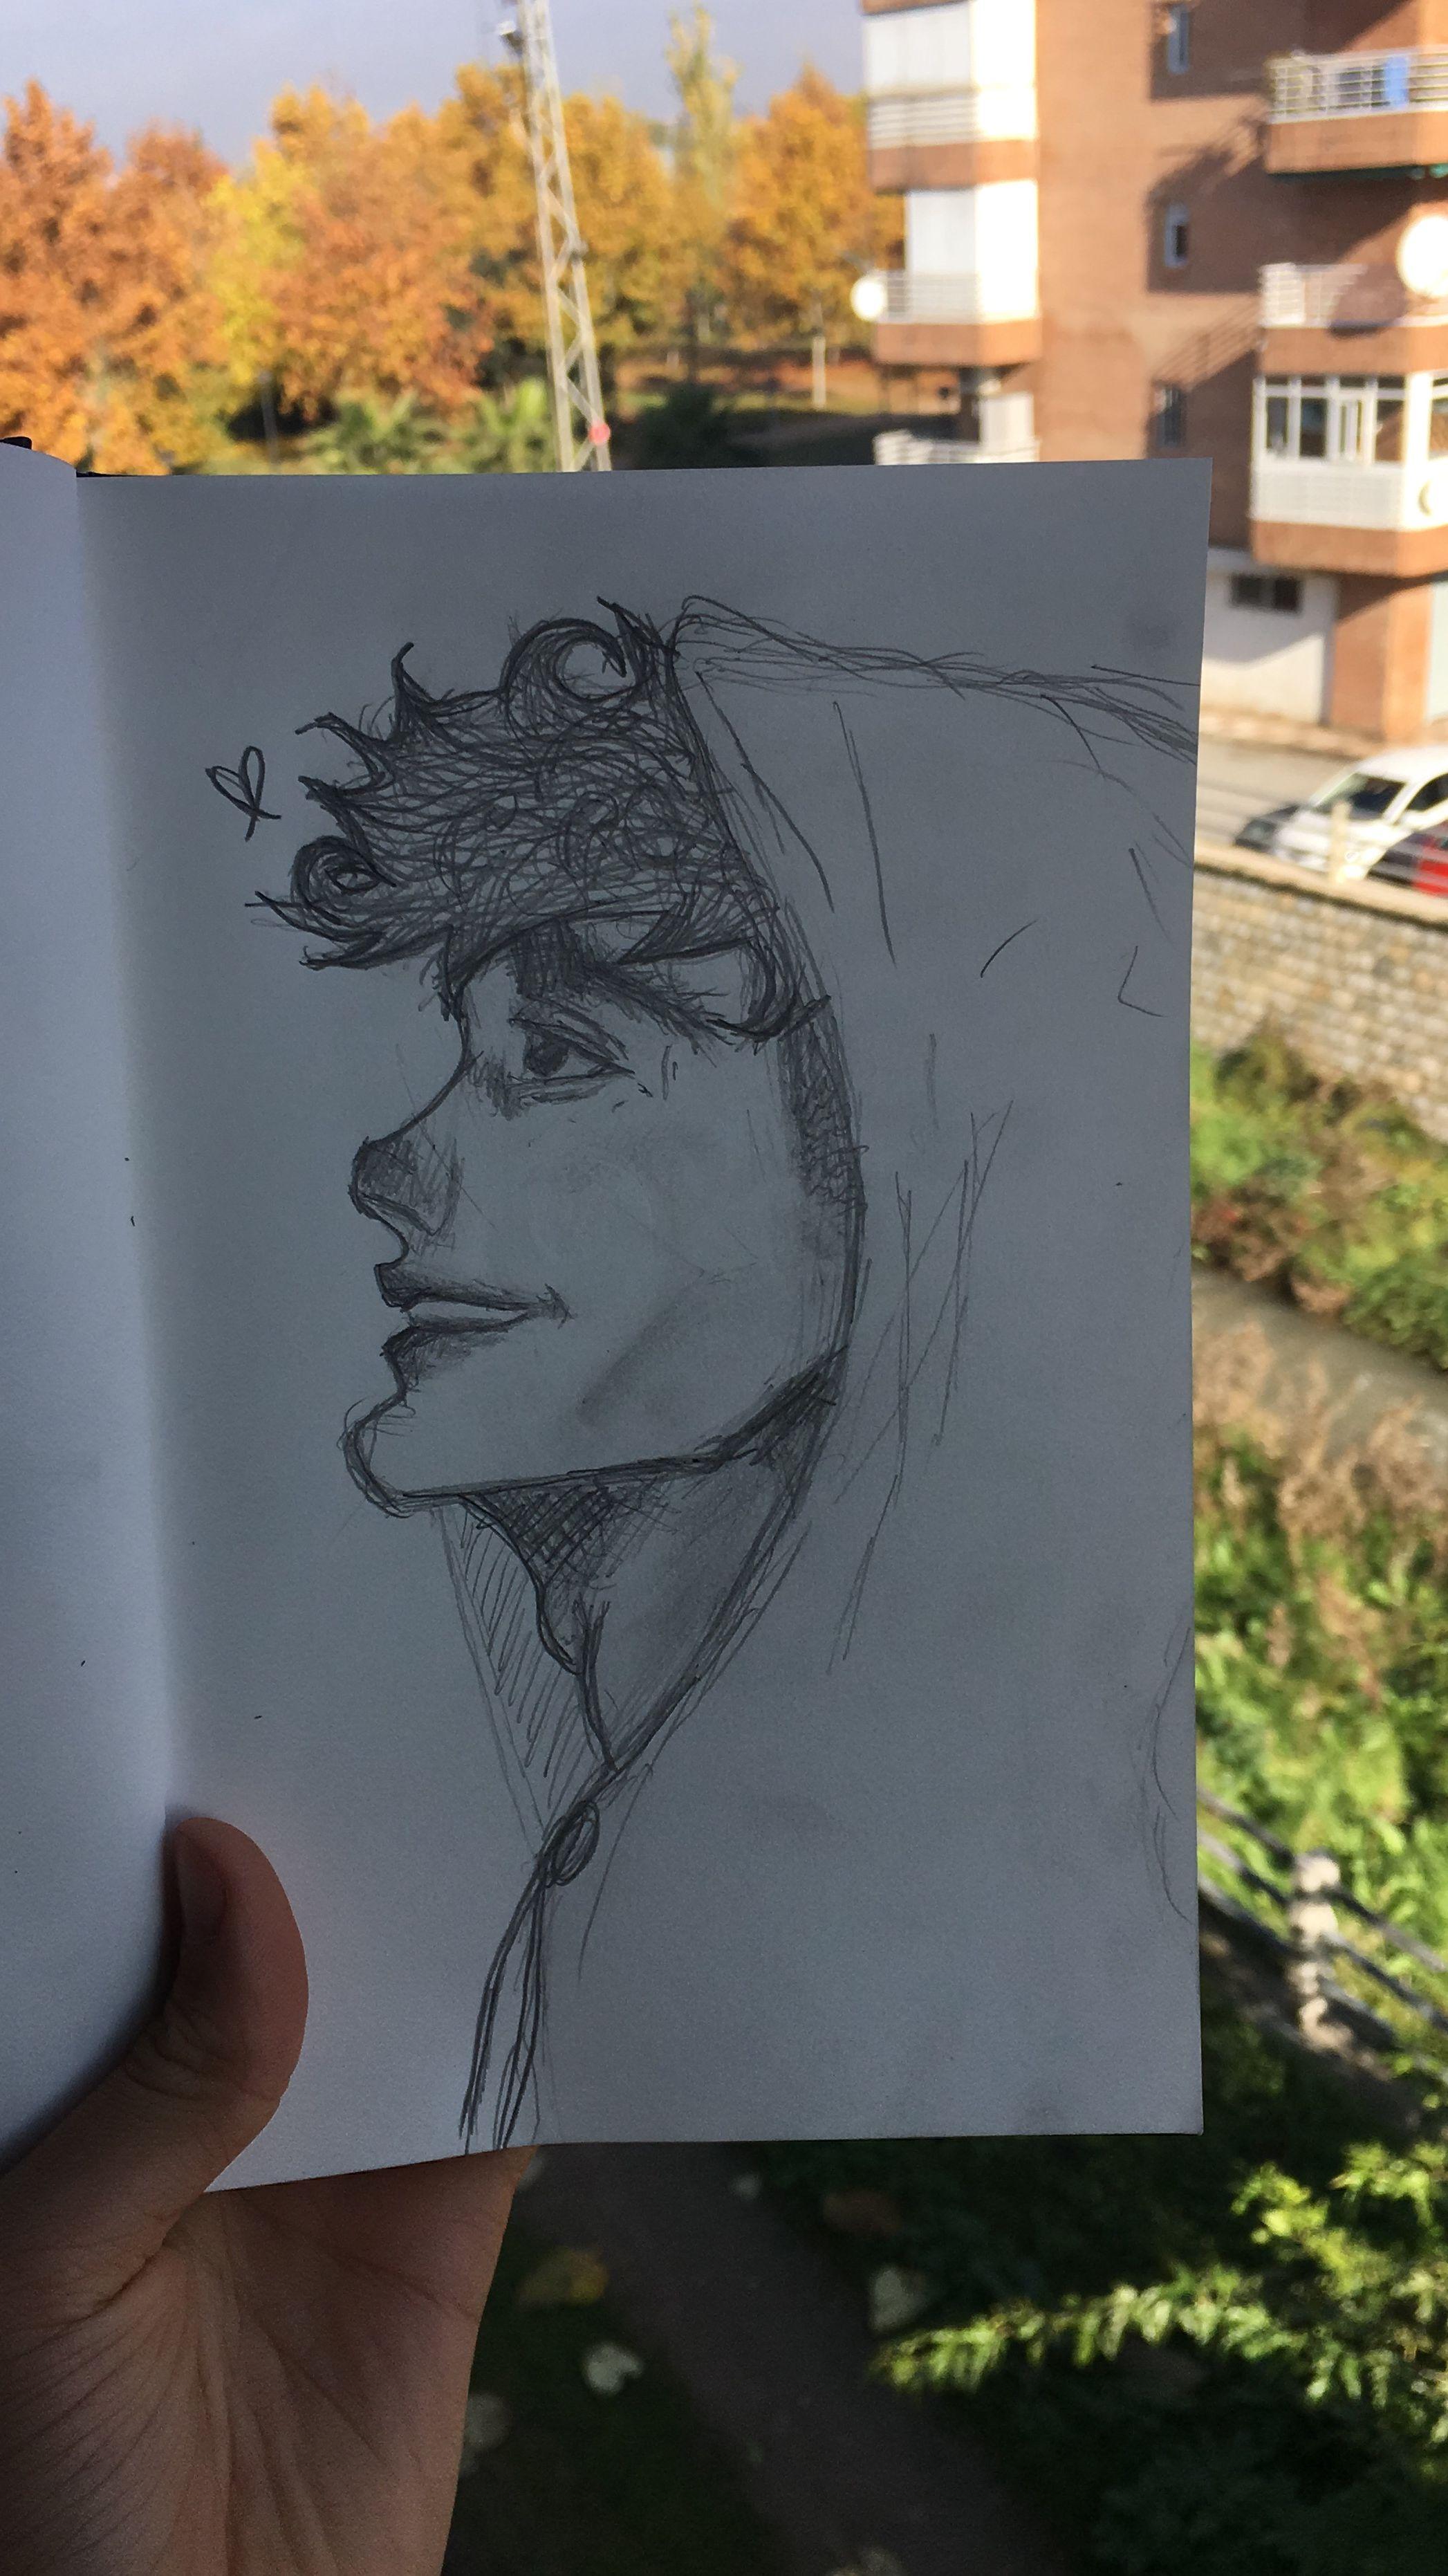 Dibujo a lapiz tumblr chico | Dibujos a lapiz tumblr, Dibujos de amor tumblr,  Dibujos